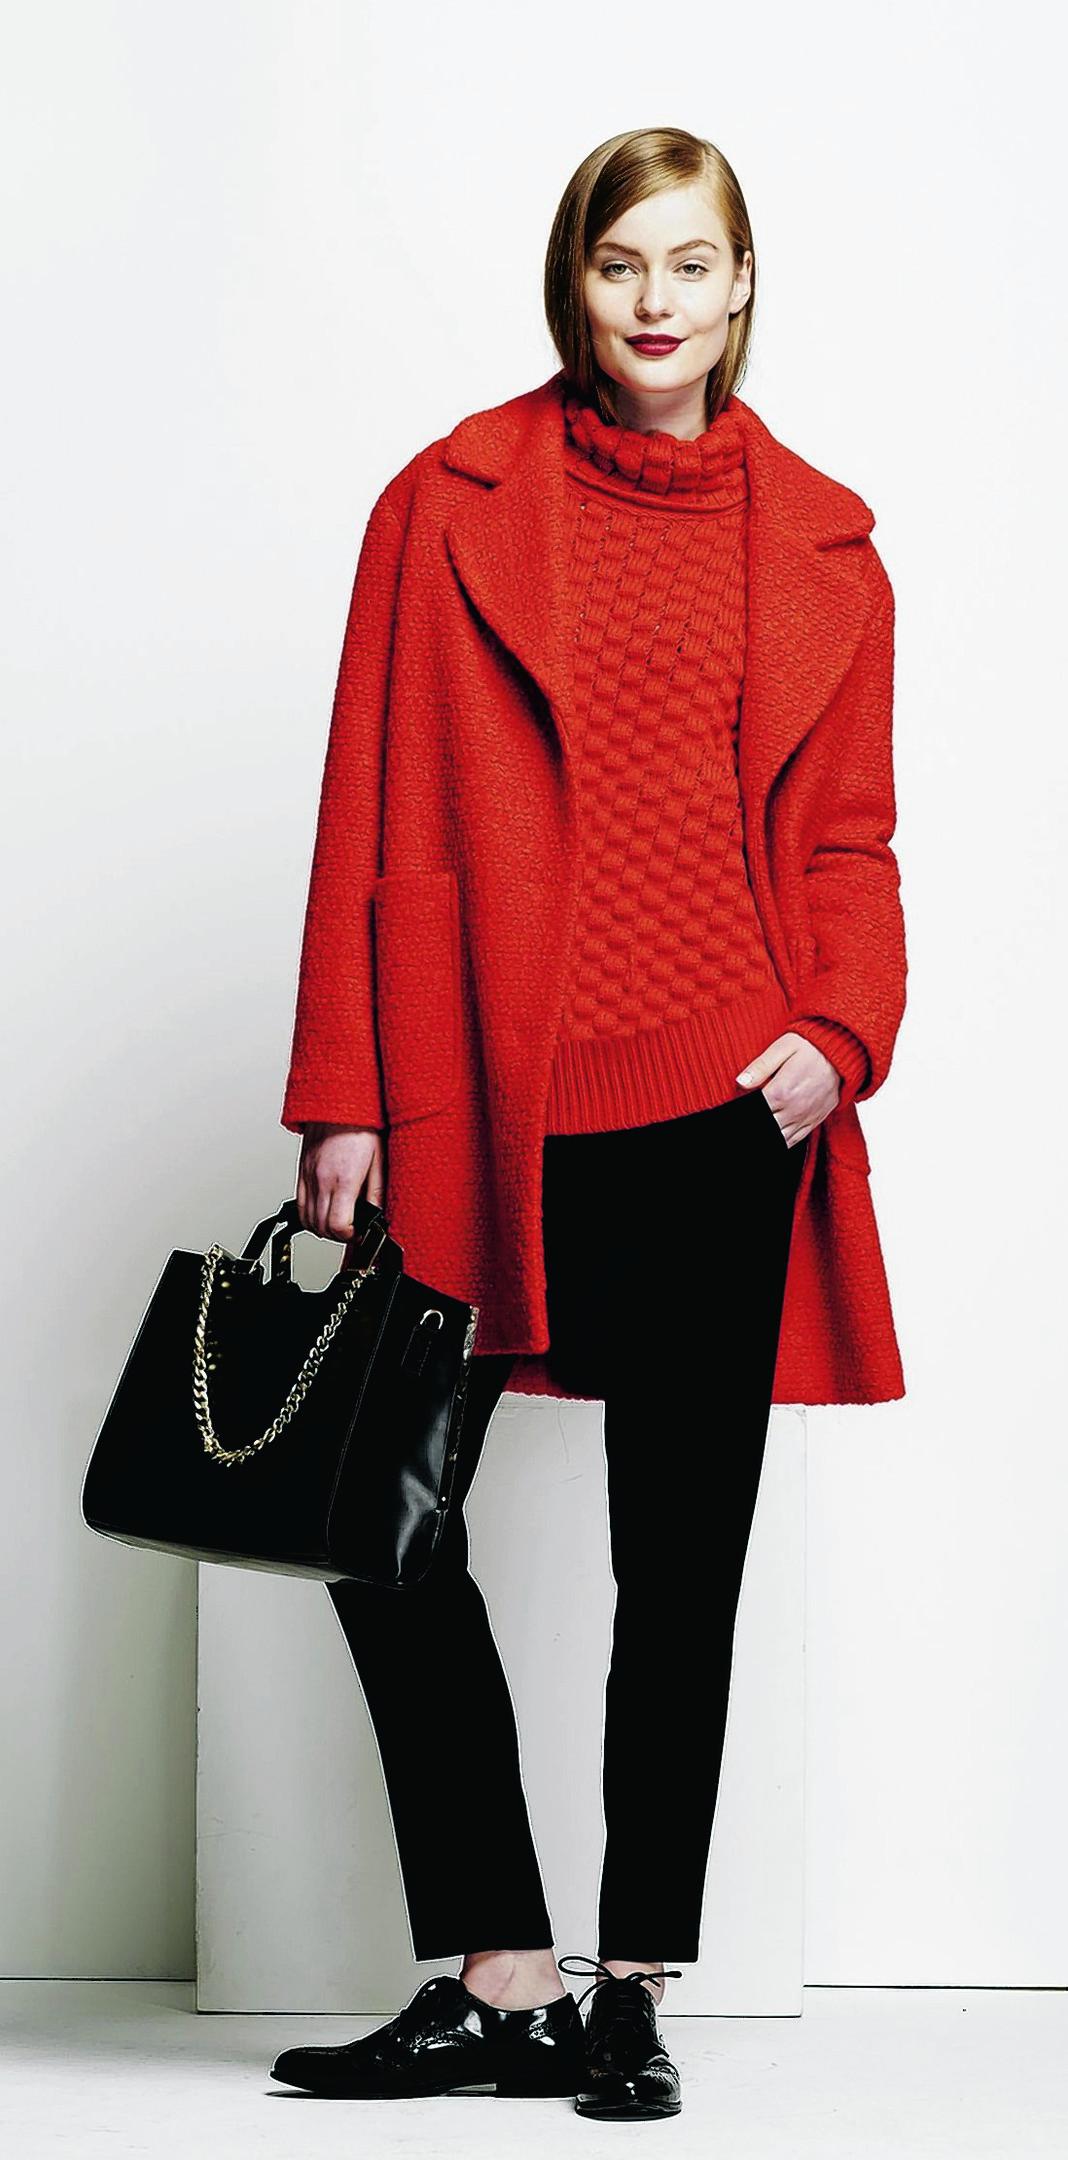 Coat, £65; roll neck jumper, £35; black trousers, £22; bag, £38; all Red Herring at Debenhams